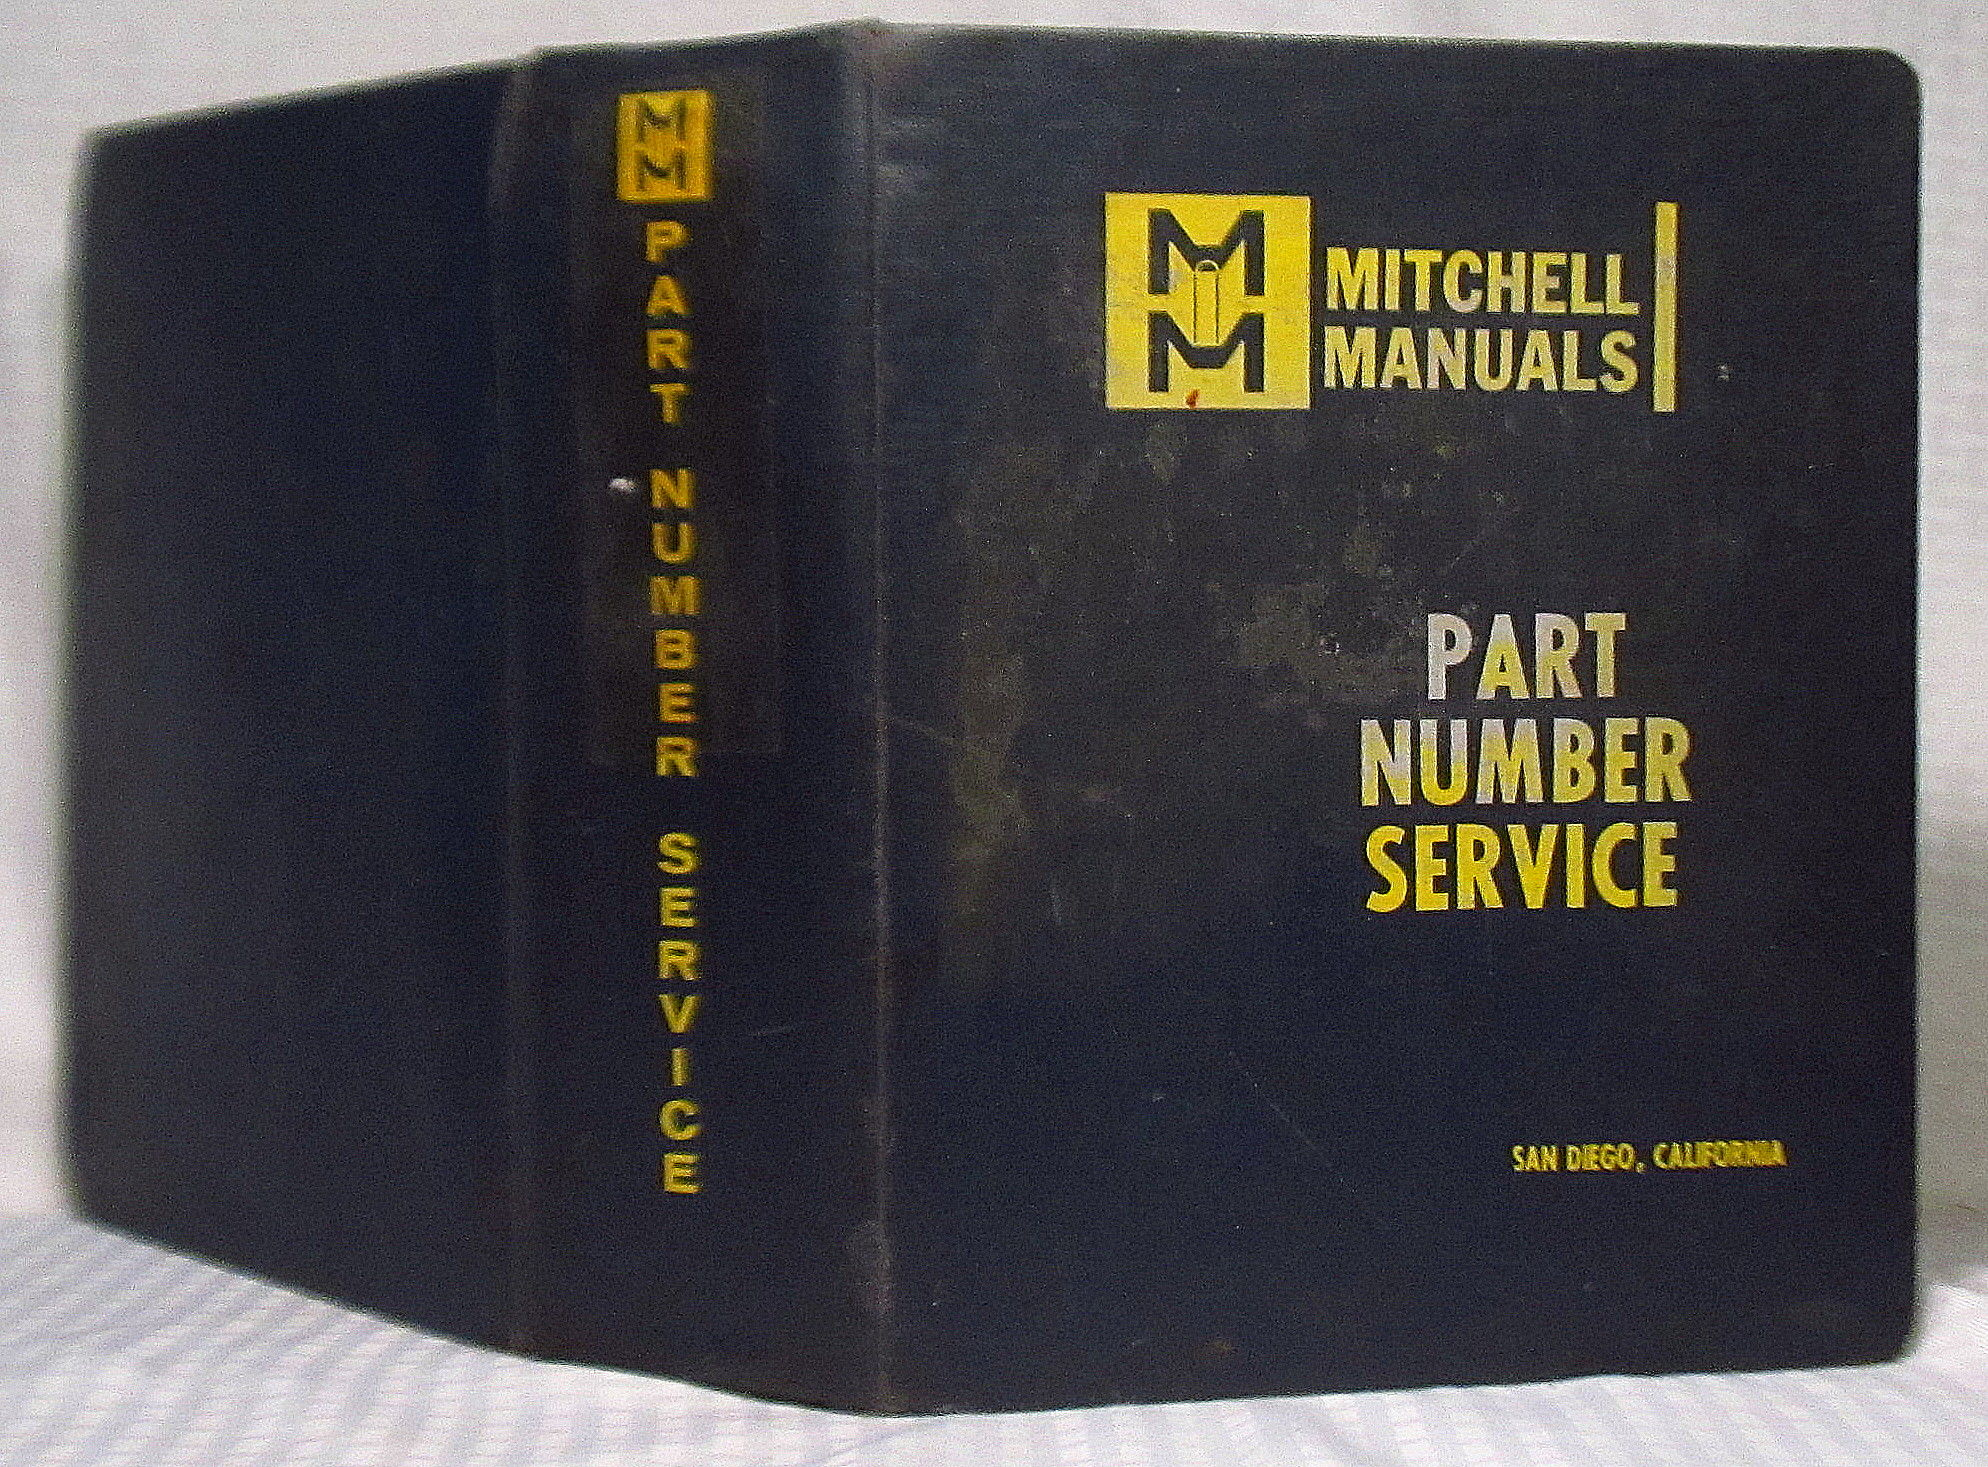 Part number service cadillac gm parts division 1966 for General motors parts division